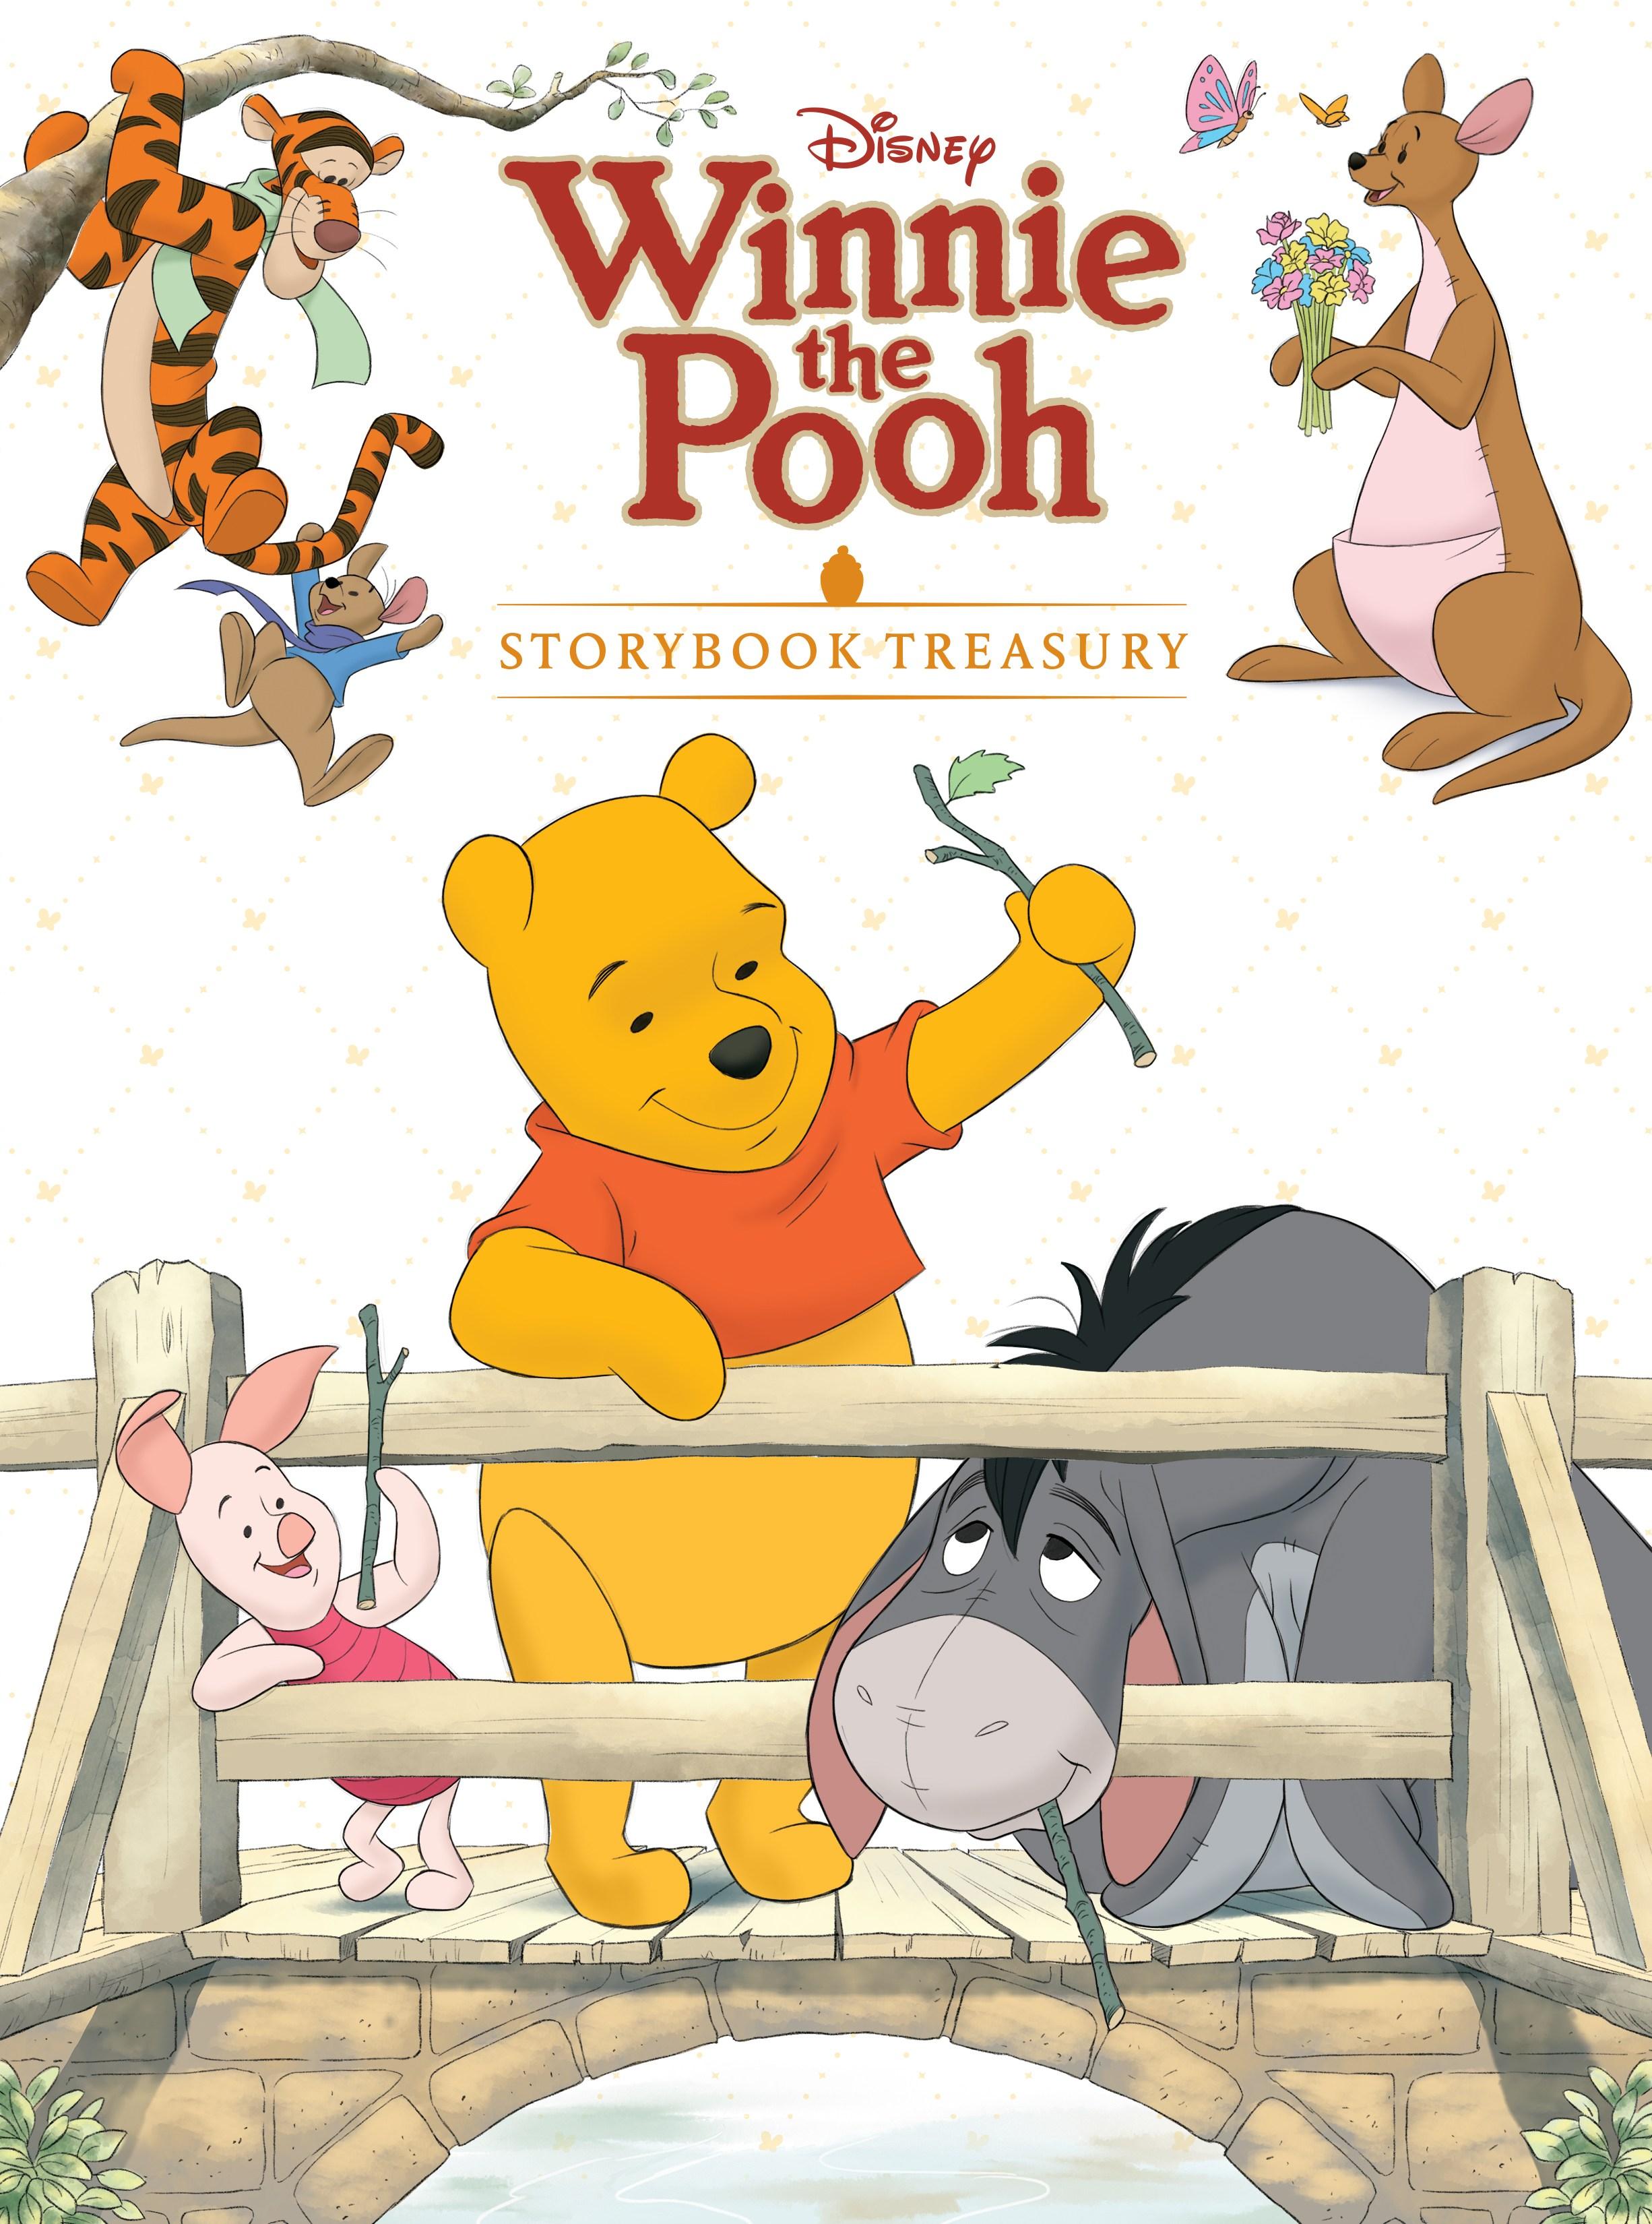 Winnie the Pooh Storybook Treasury.